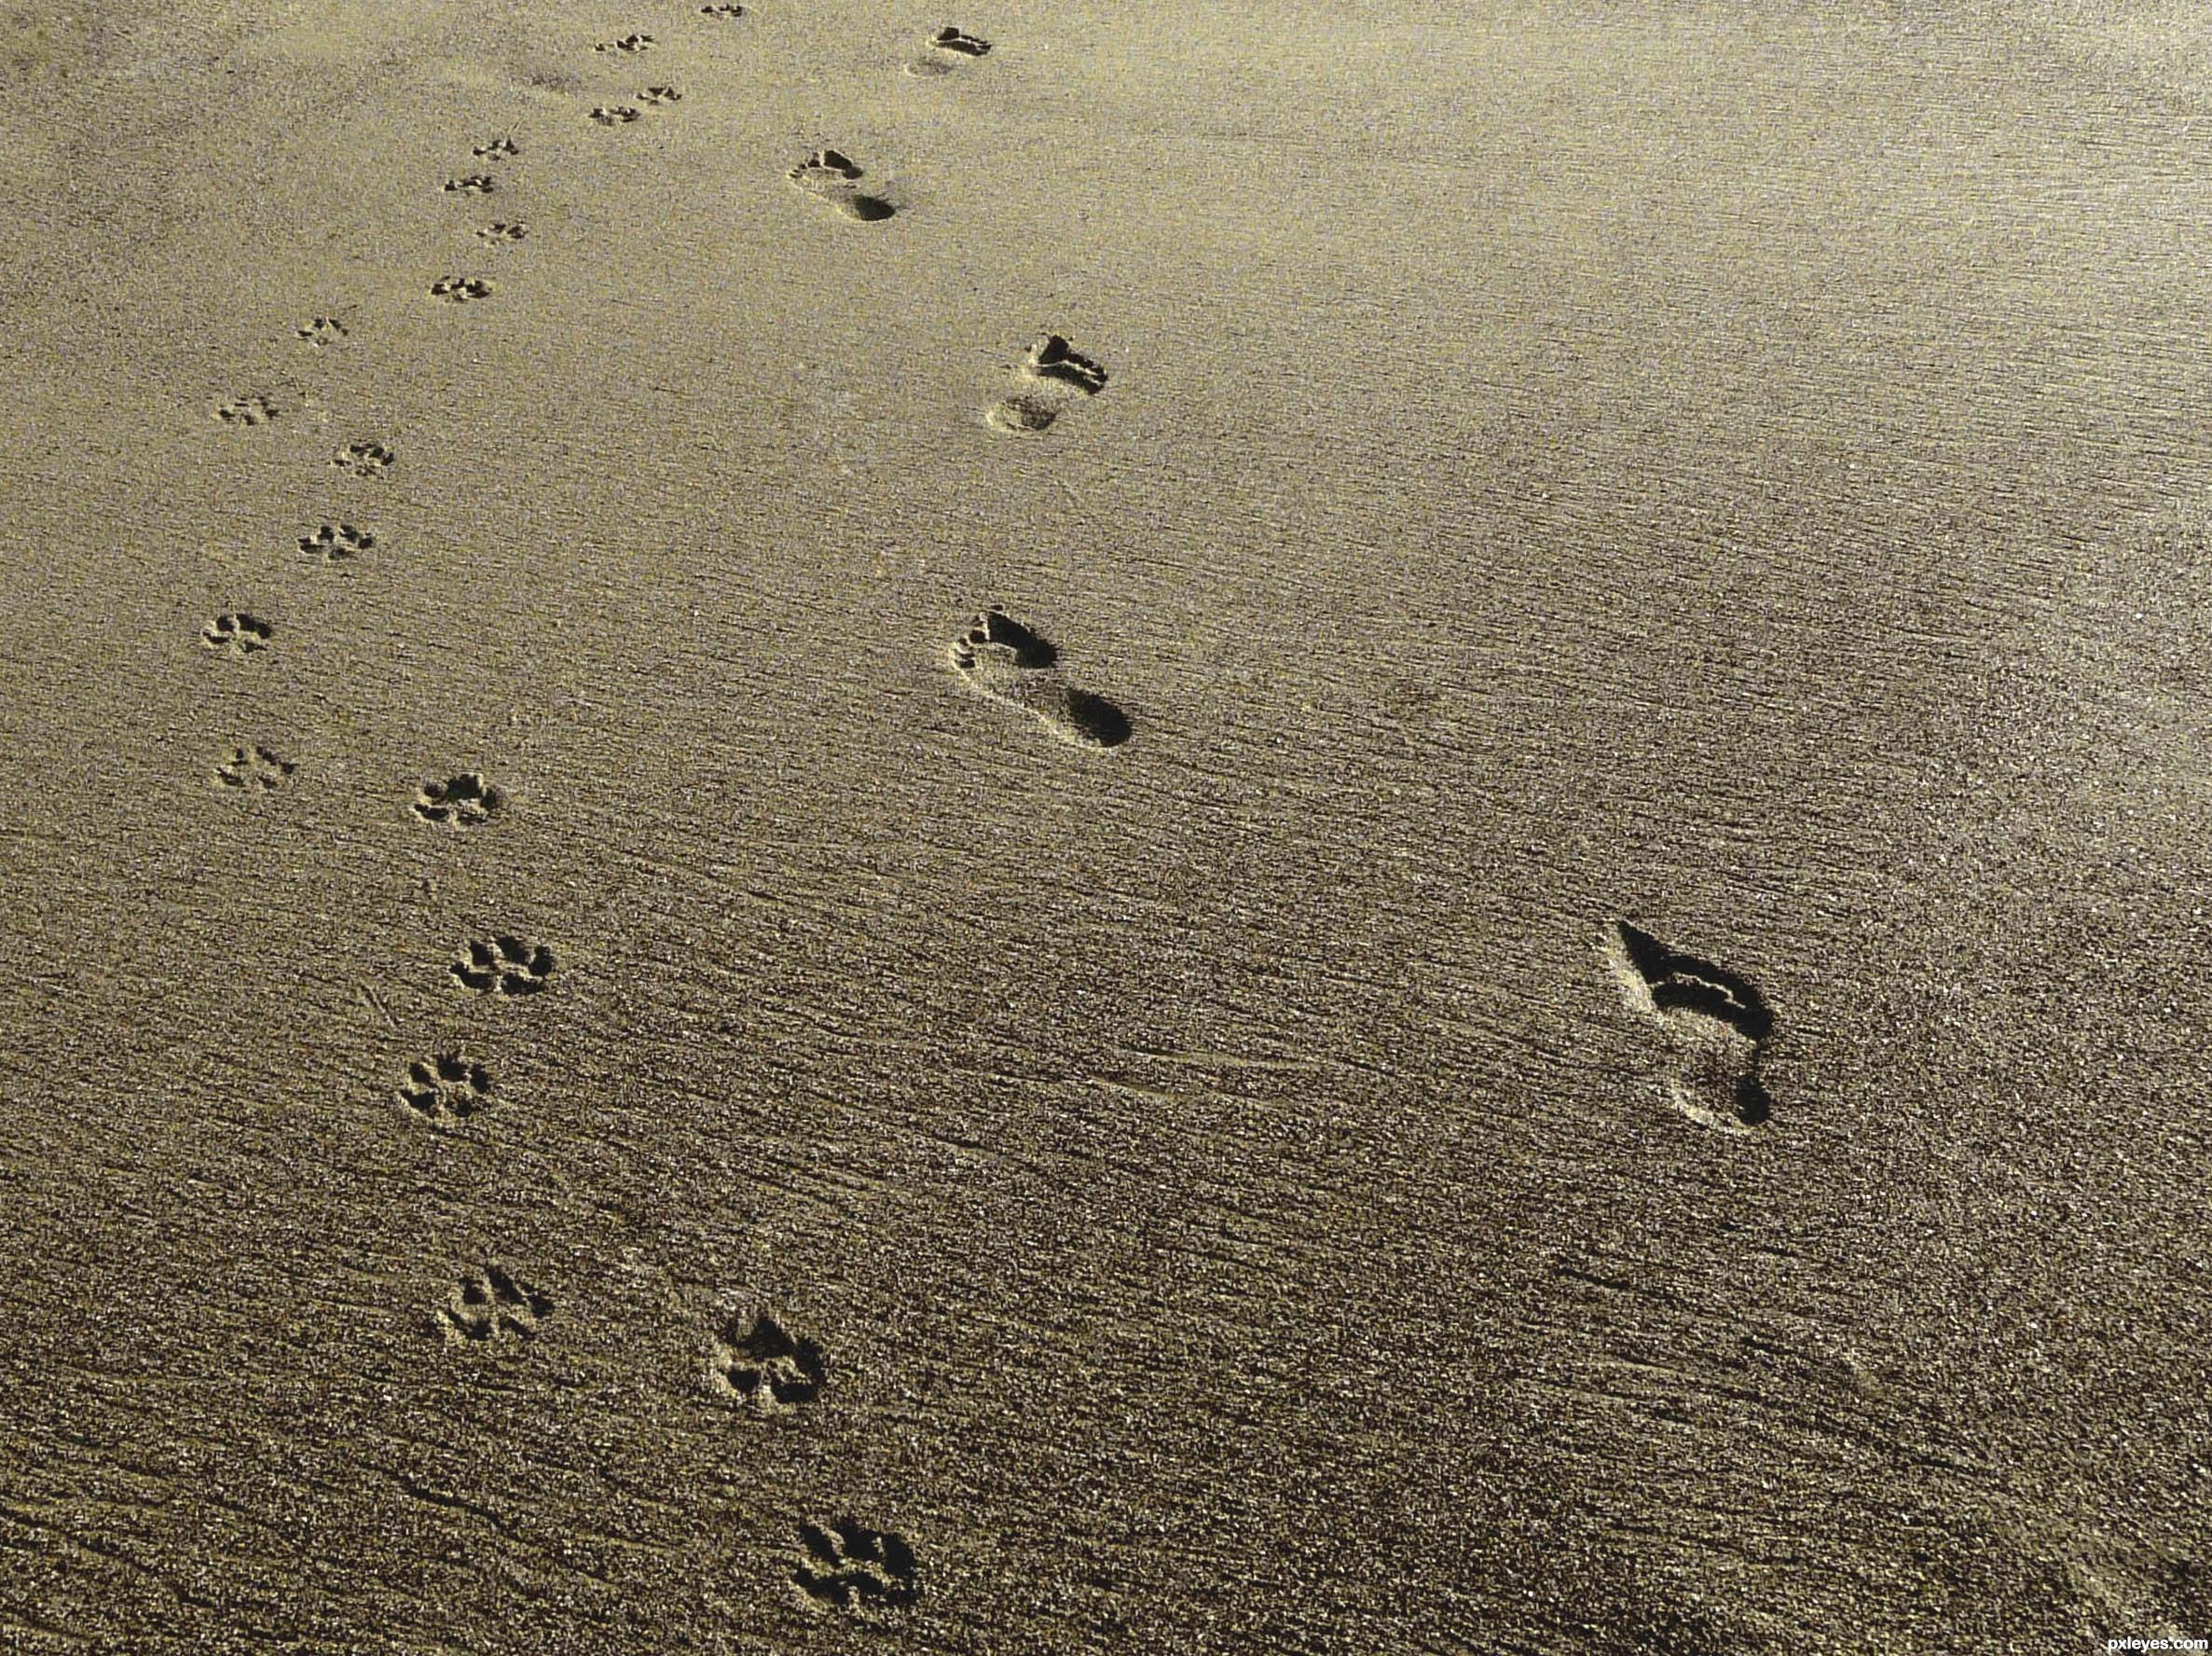 Dog Footprint Vs Cat Footprint